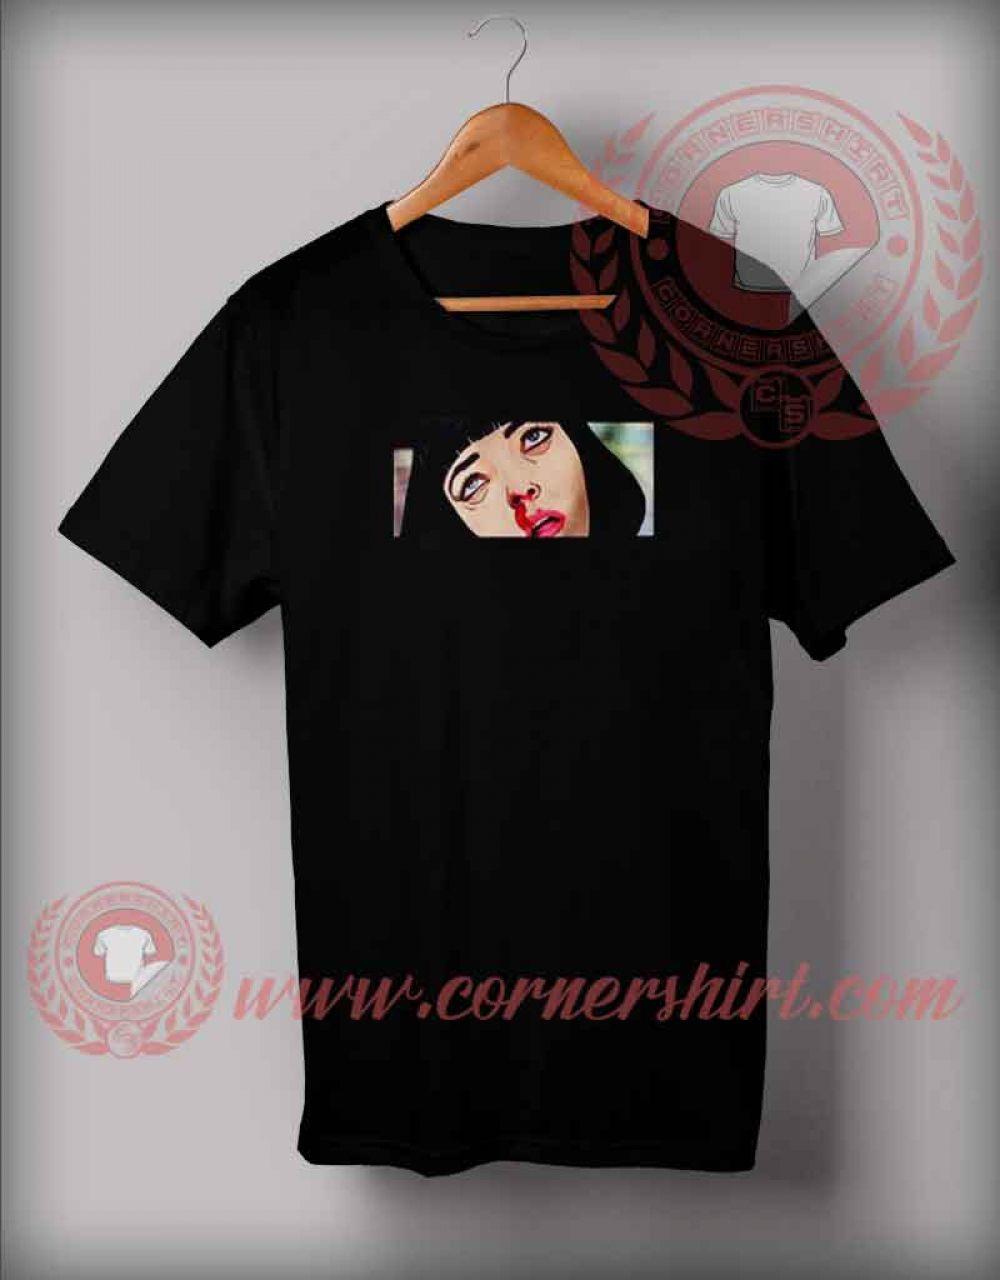 4240deca9 Pulp Fiction Nosebleeds T shirt in 2019 | Movie T shirts | Cheap ...